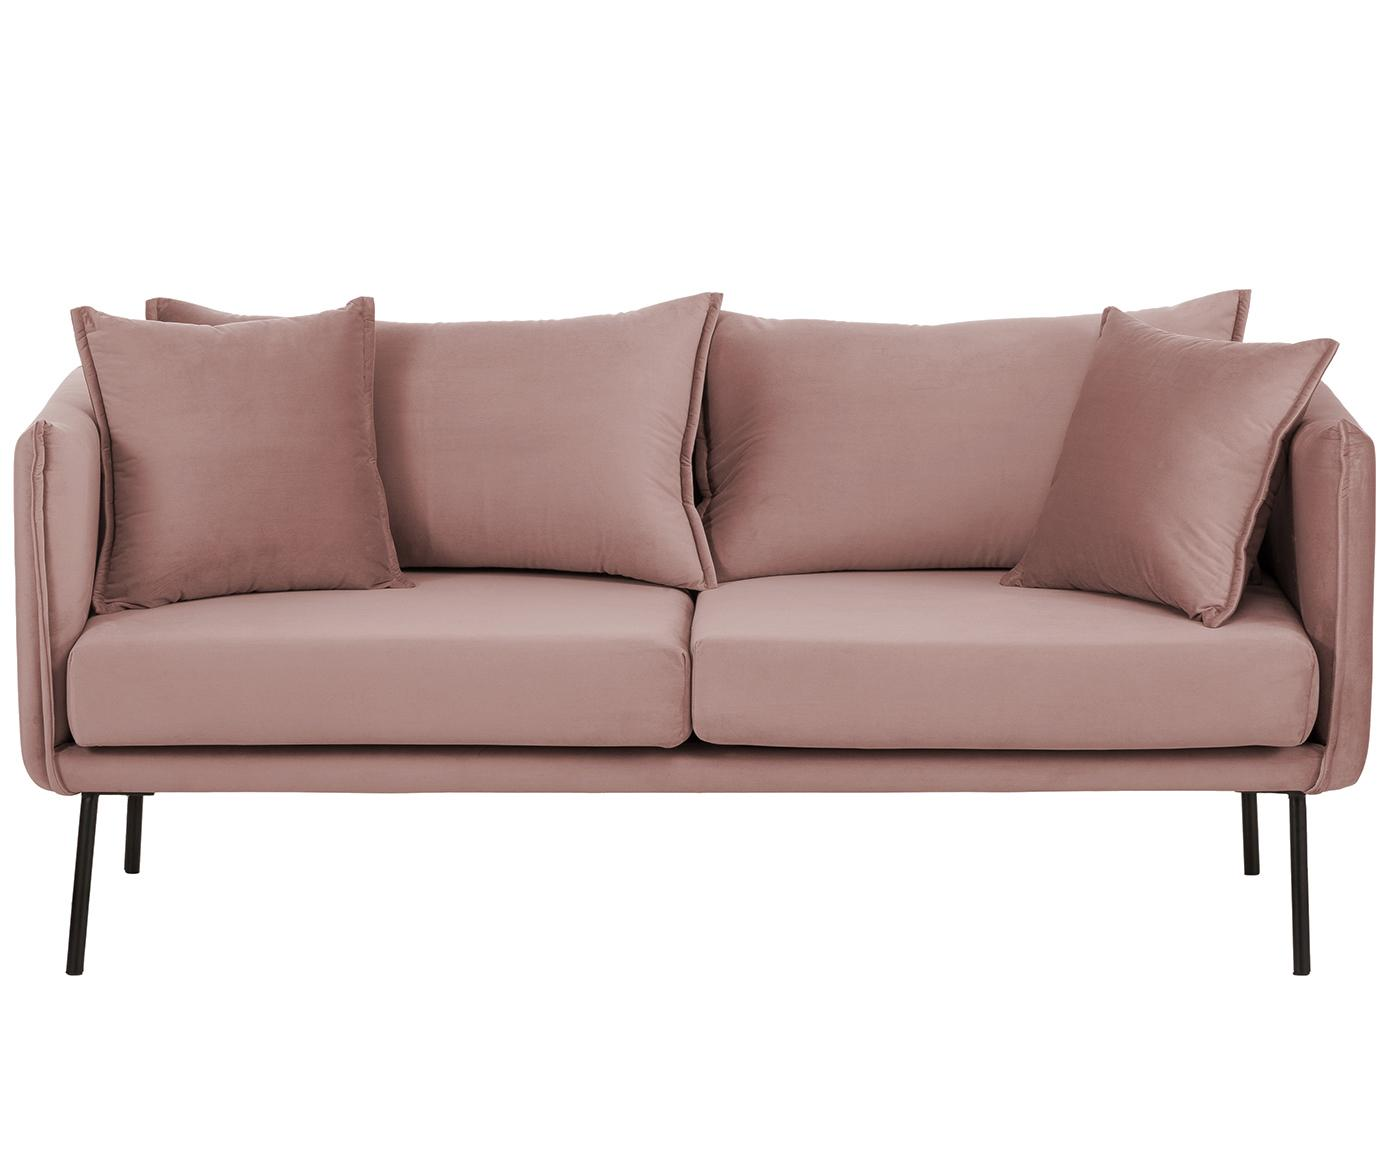 Samt-Sofa Ivy (2-Sitzer), Bezug: Samt (Polyester) 15.000 S, Gestell: Metall, Füße: Metall, pulverbeschichtet, Bezug: Rosa Füße: Schwarz, B 170 x T 75 cm